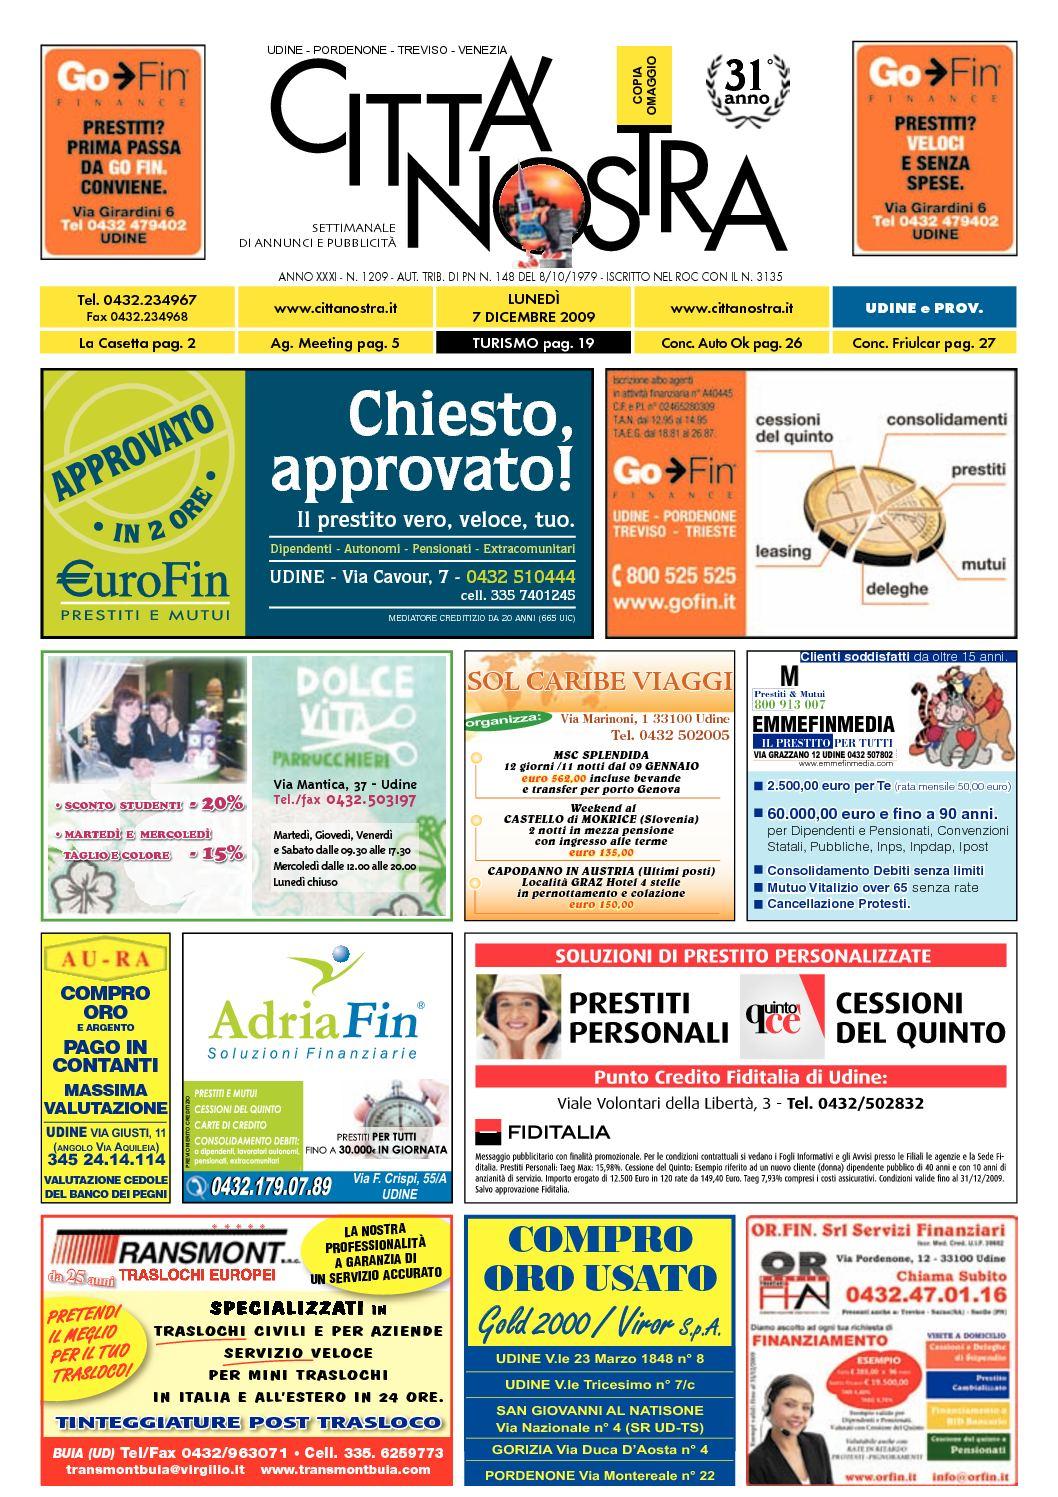 Calaméo Citt Nostra Udine Del 07 12 2009 N 1209